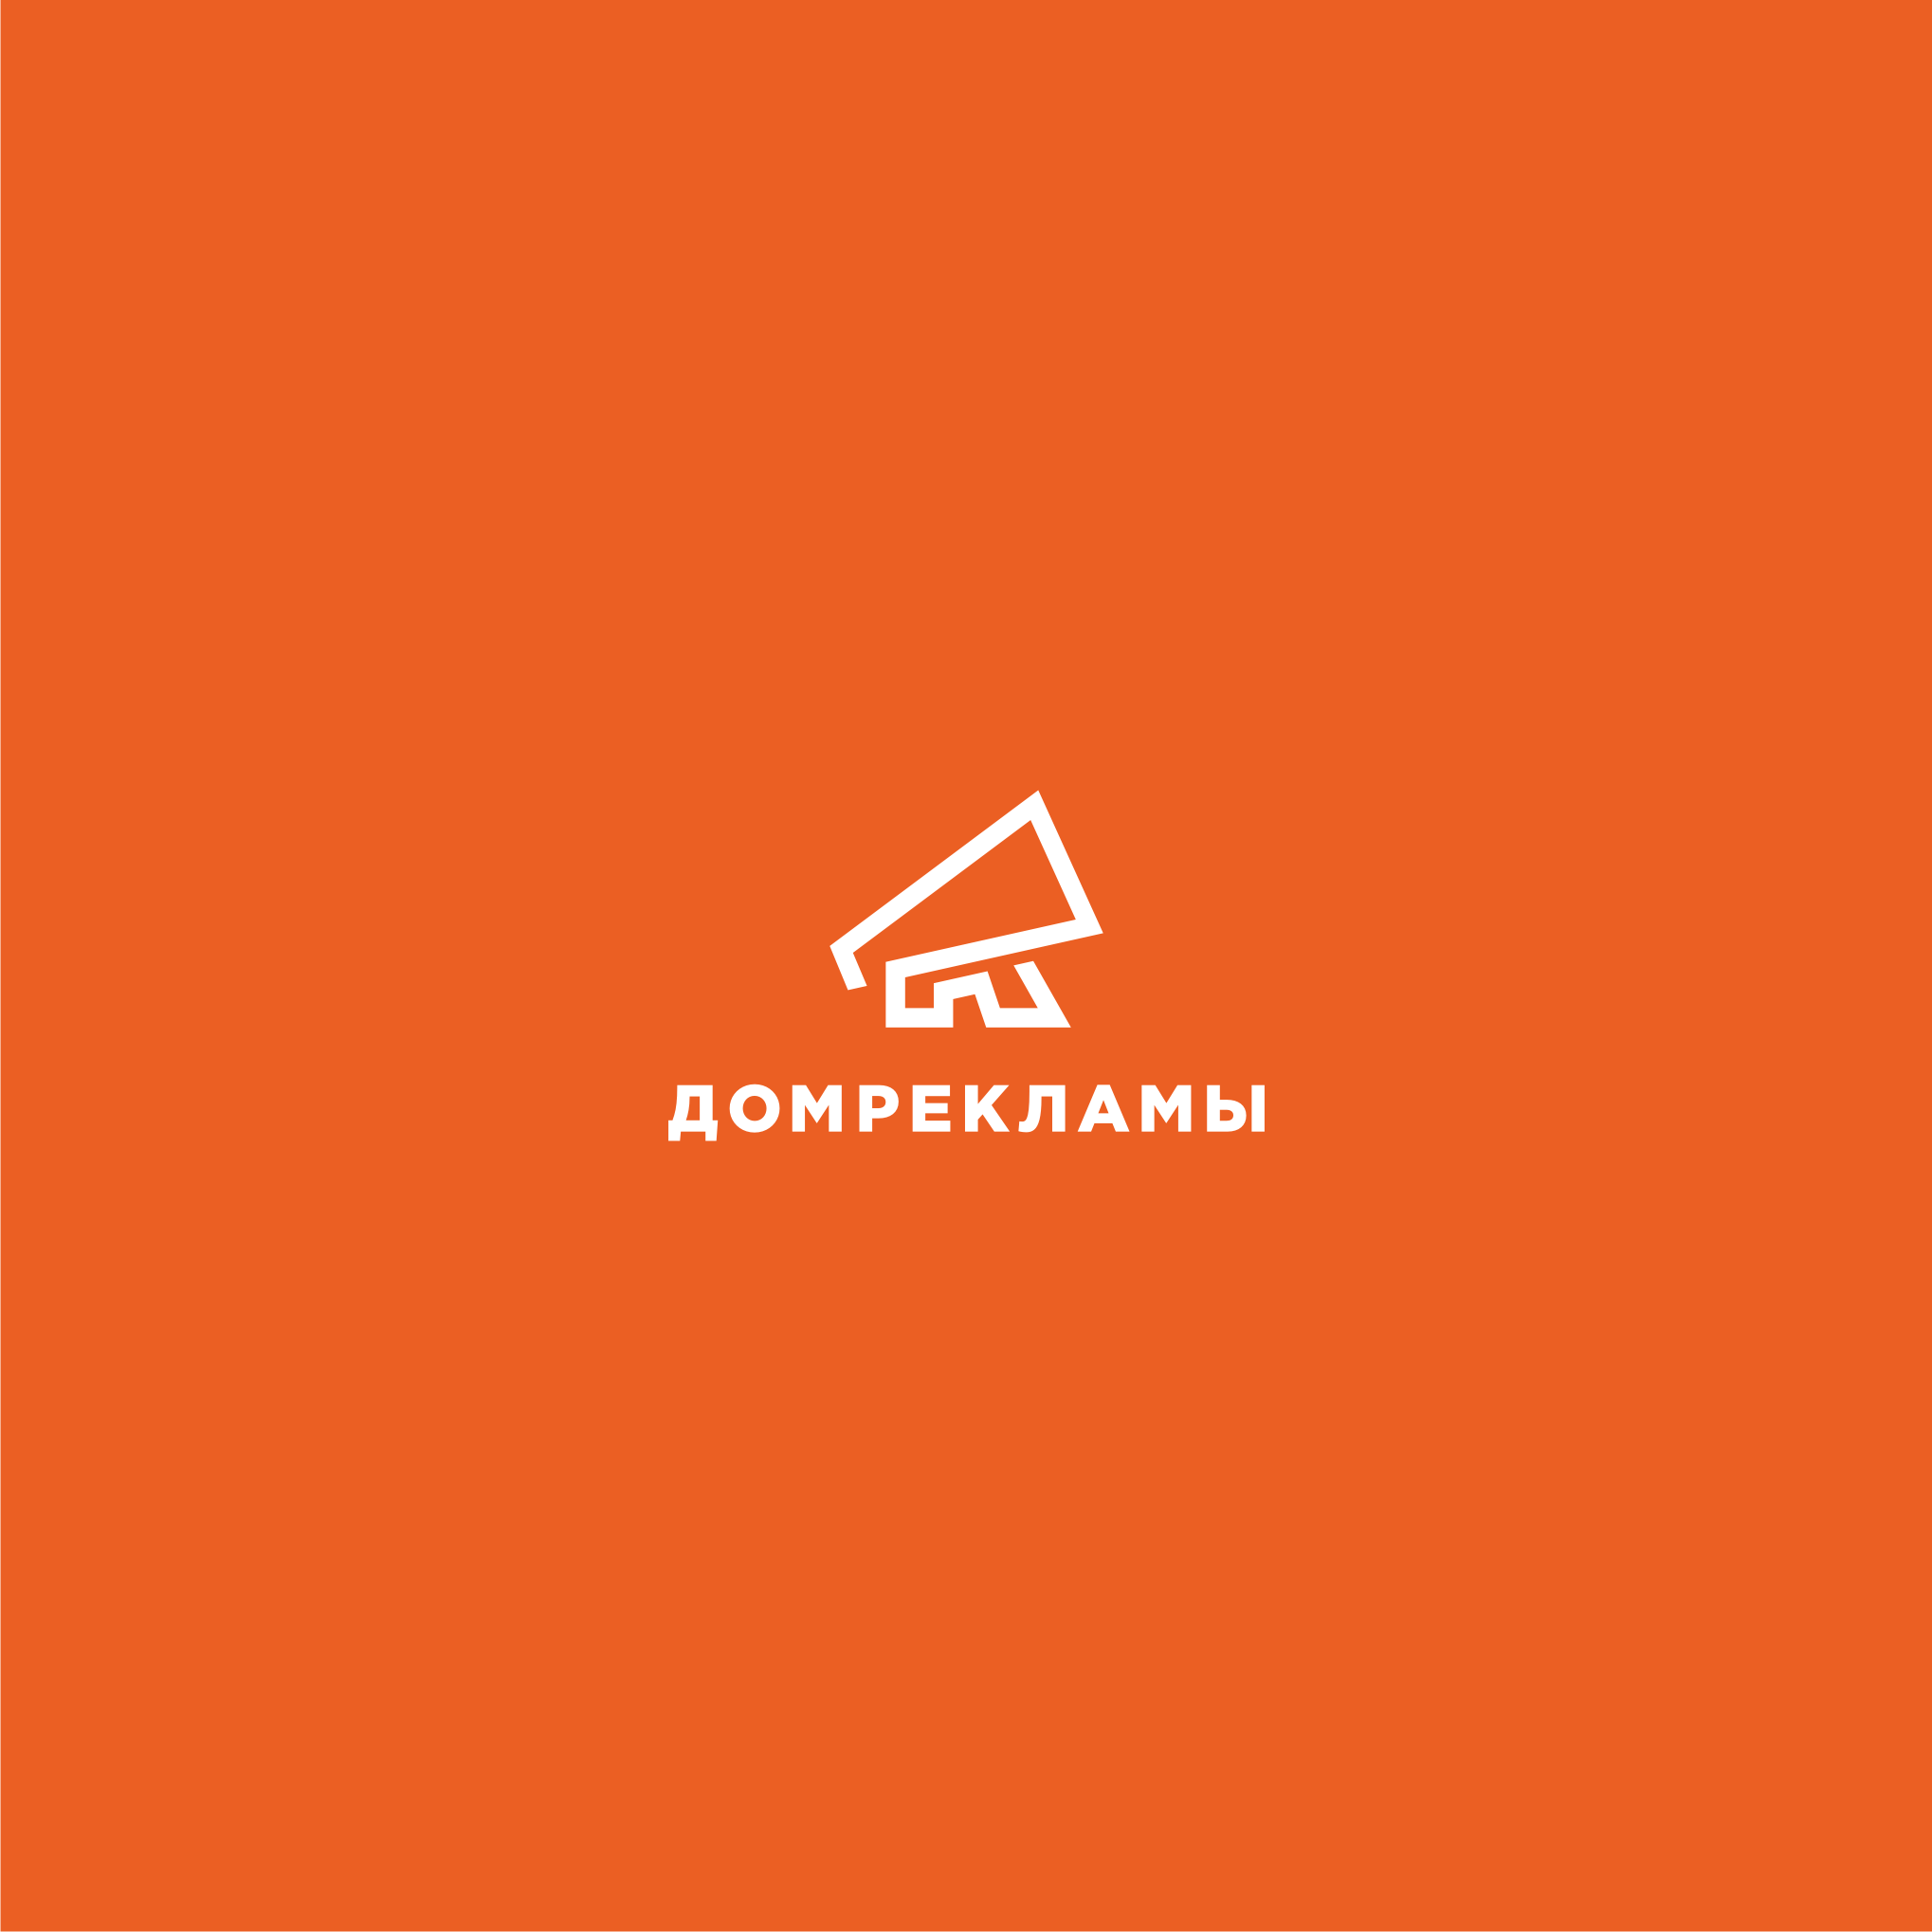 Дизайн логотипа рекламно-производственной компании фото f_6375edb2f8a30099.png